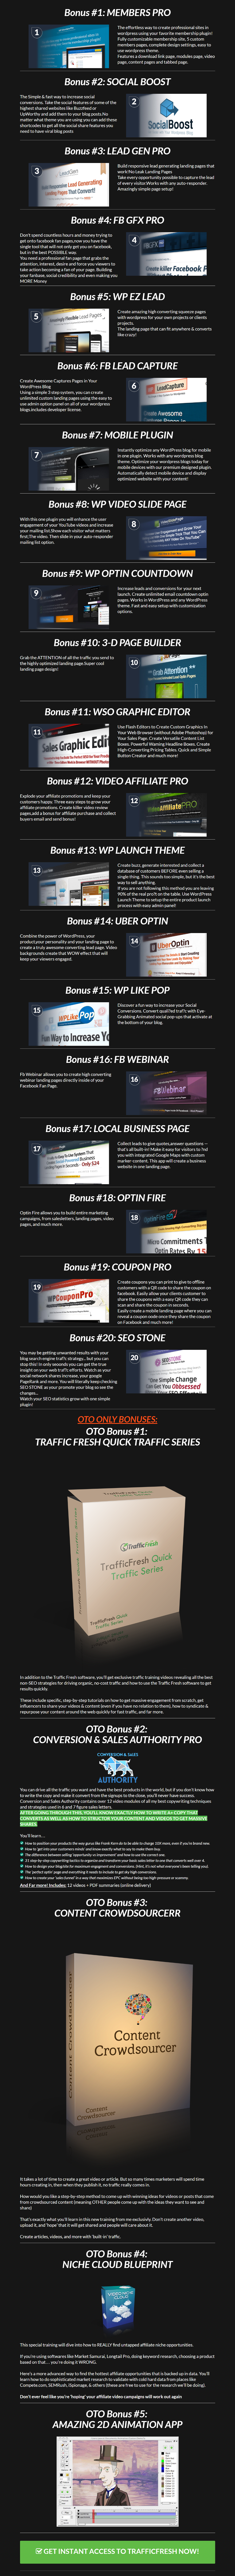 TrafficFresh Bonuses